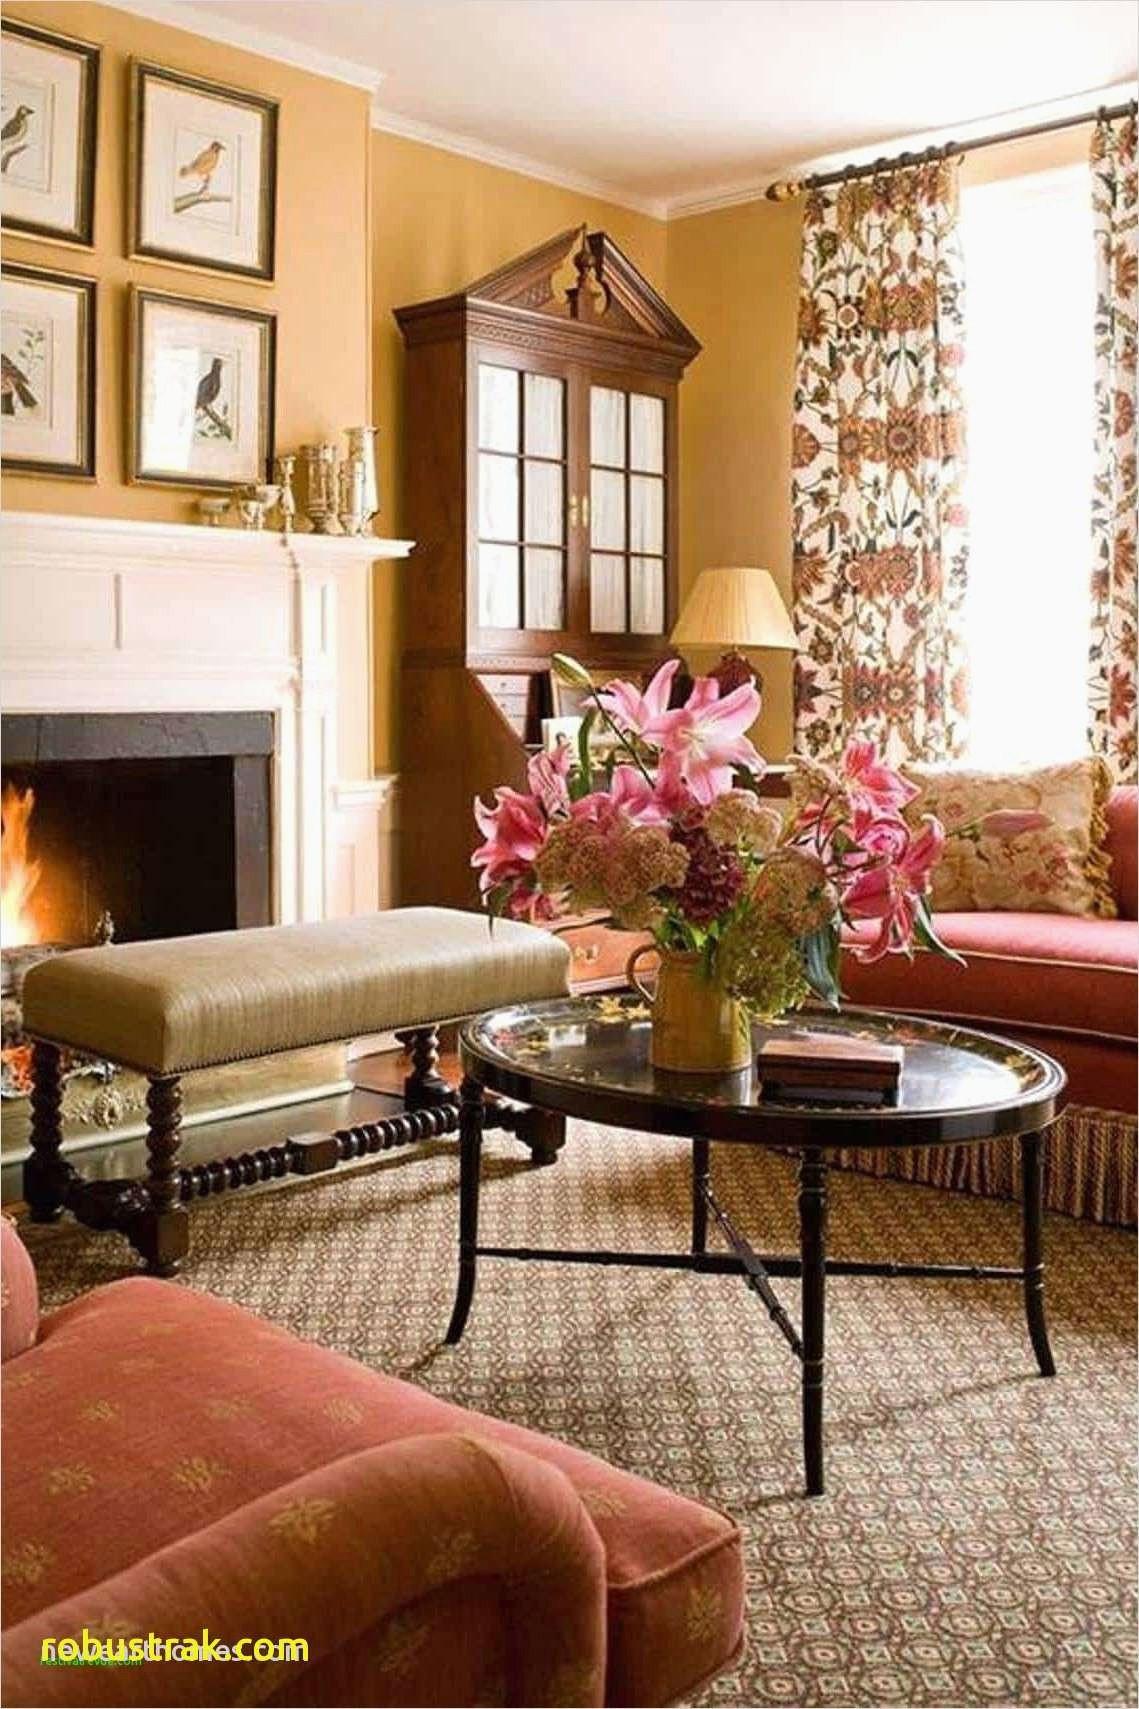 Cheap Vases Walmart Of 26 Lovely Carpet Tiles Walmart Peritile Throughout Living Room Flower Vaseh Vases Vase Like Architecture Interior Design Follow Us I 0d From Wall